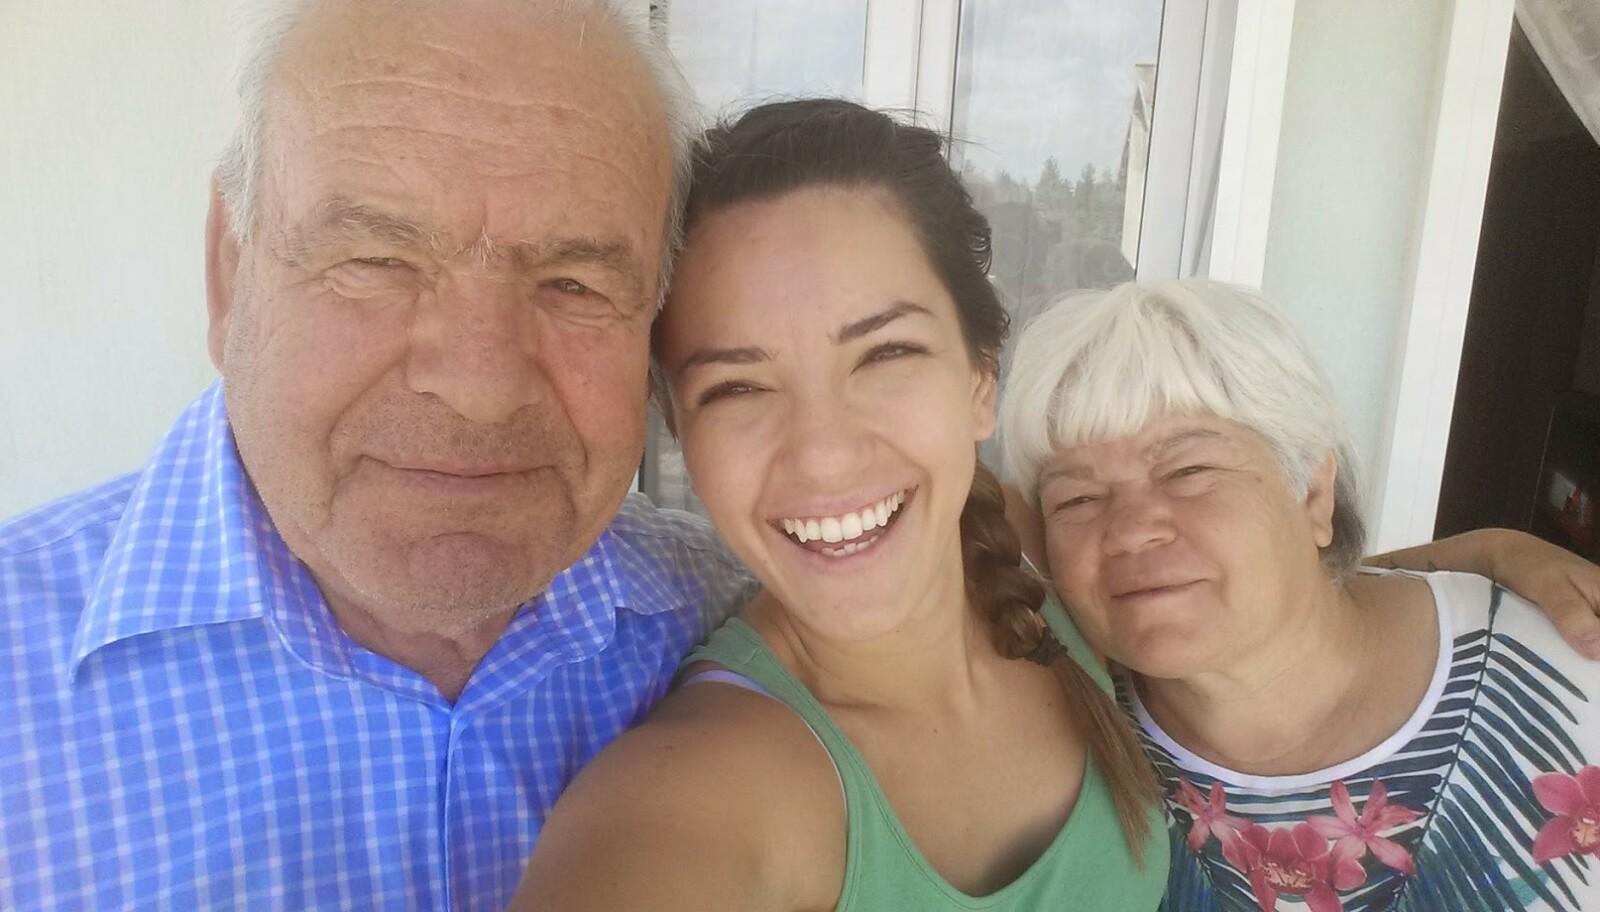 FORELDRENE: Selda med foreldrene Aziz og Gulistan i Tyrkia 2015. De kom til Norge på 70-tallet. FOTO: Privat